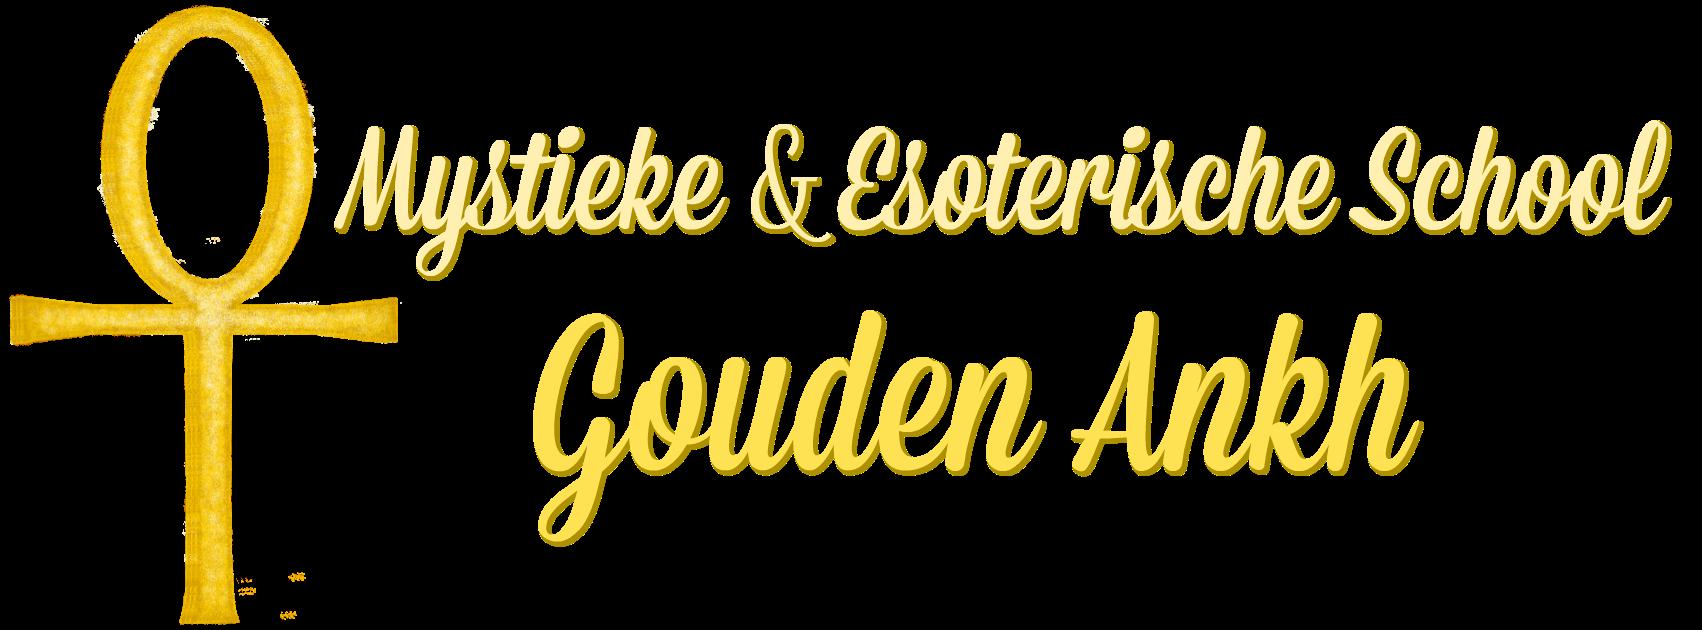 GA logo 3 new